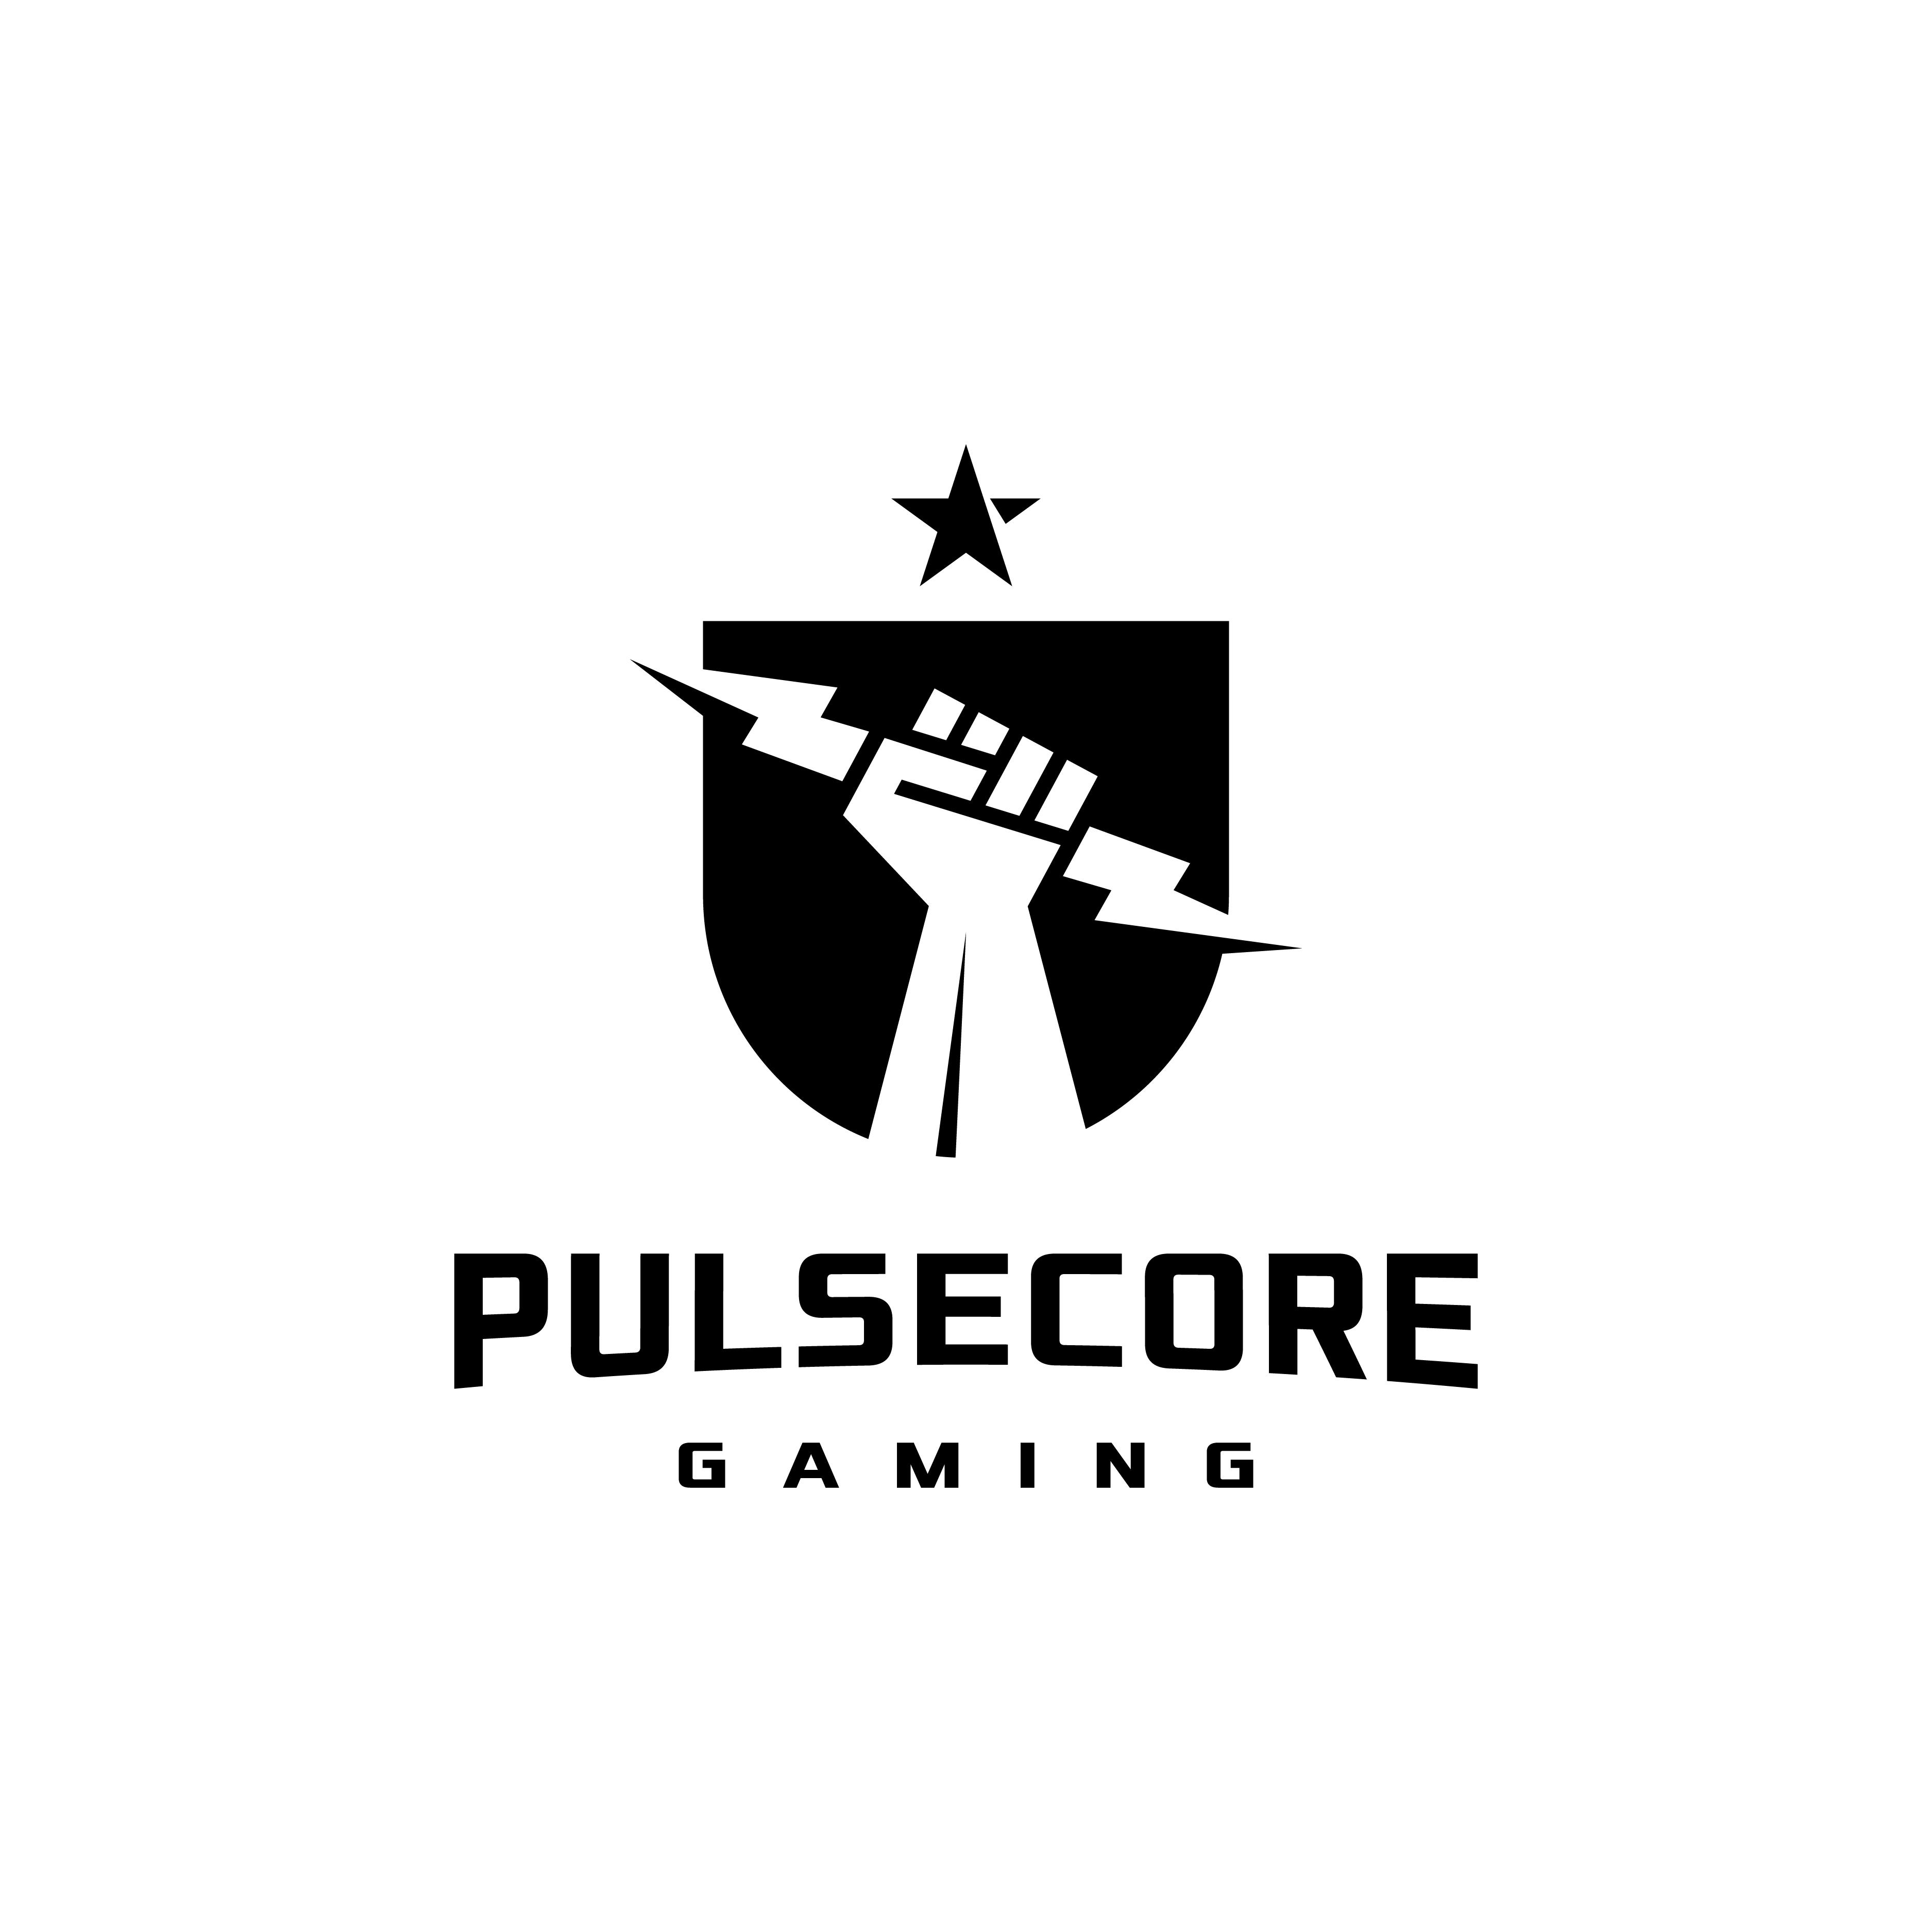 Pulsecore logo design by logo designer Radu Moraru